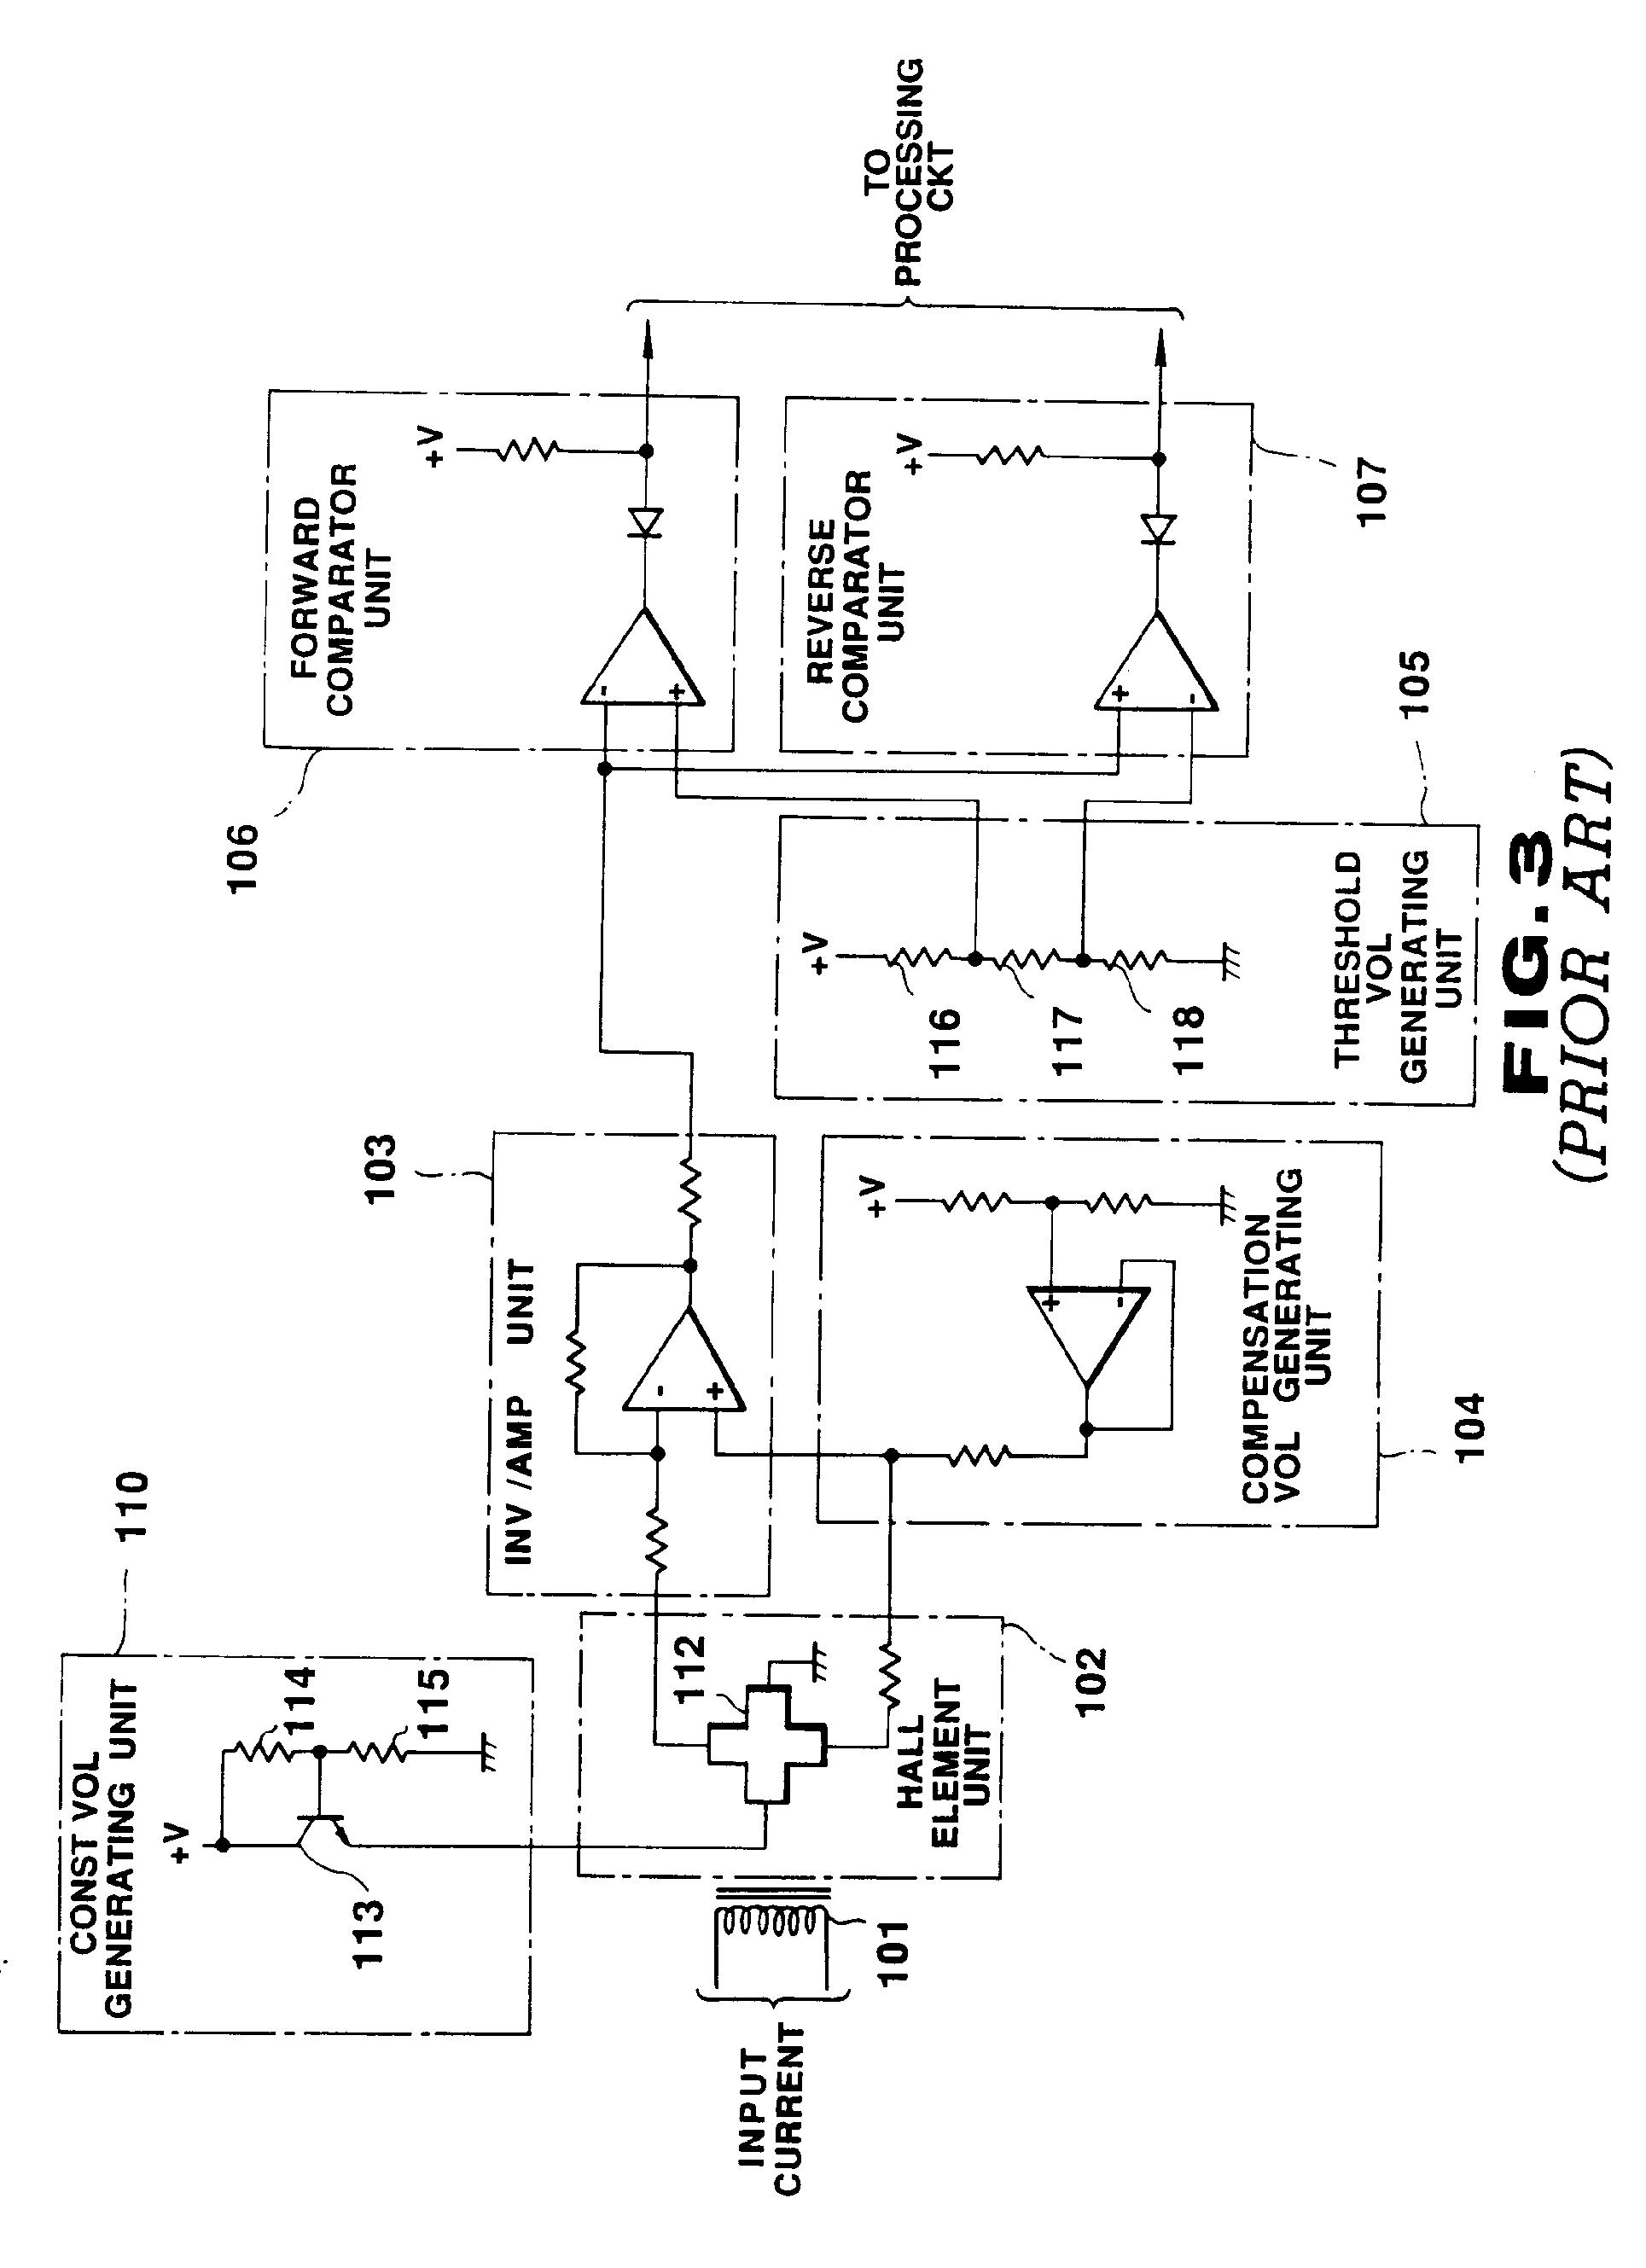 load bank alternating current regulating control google patents